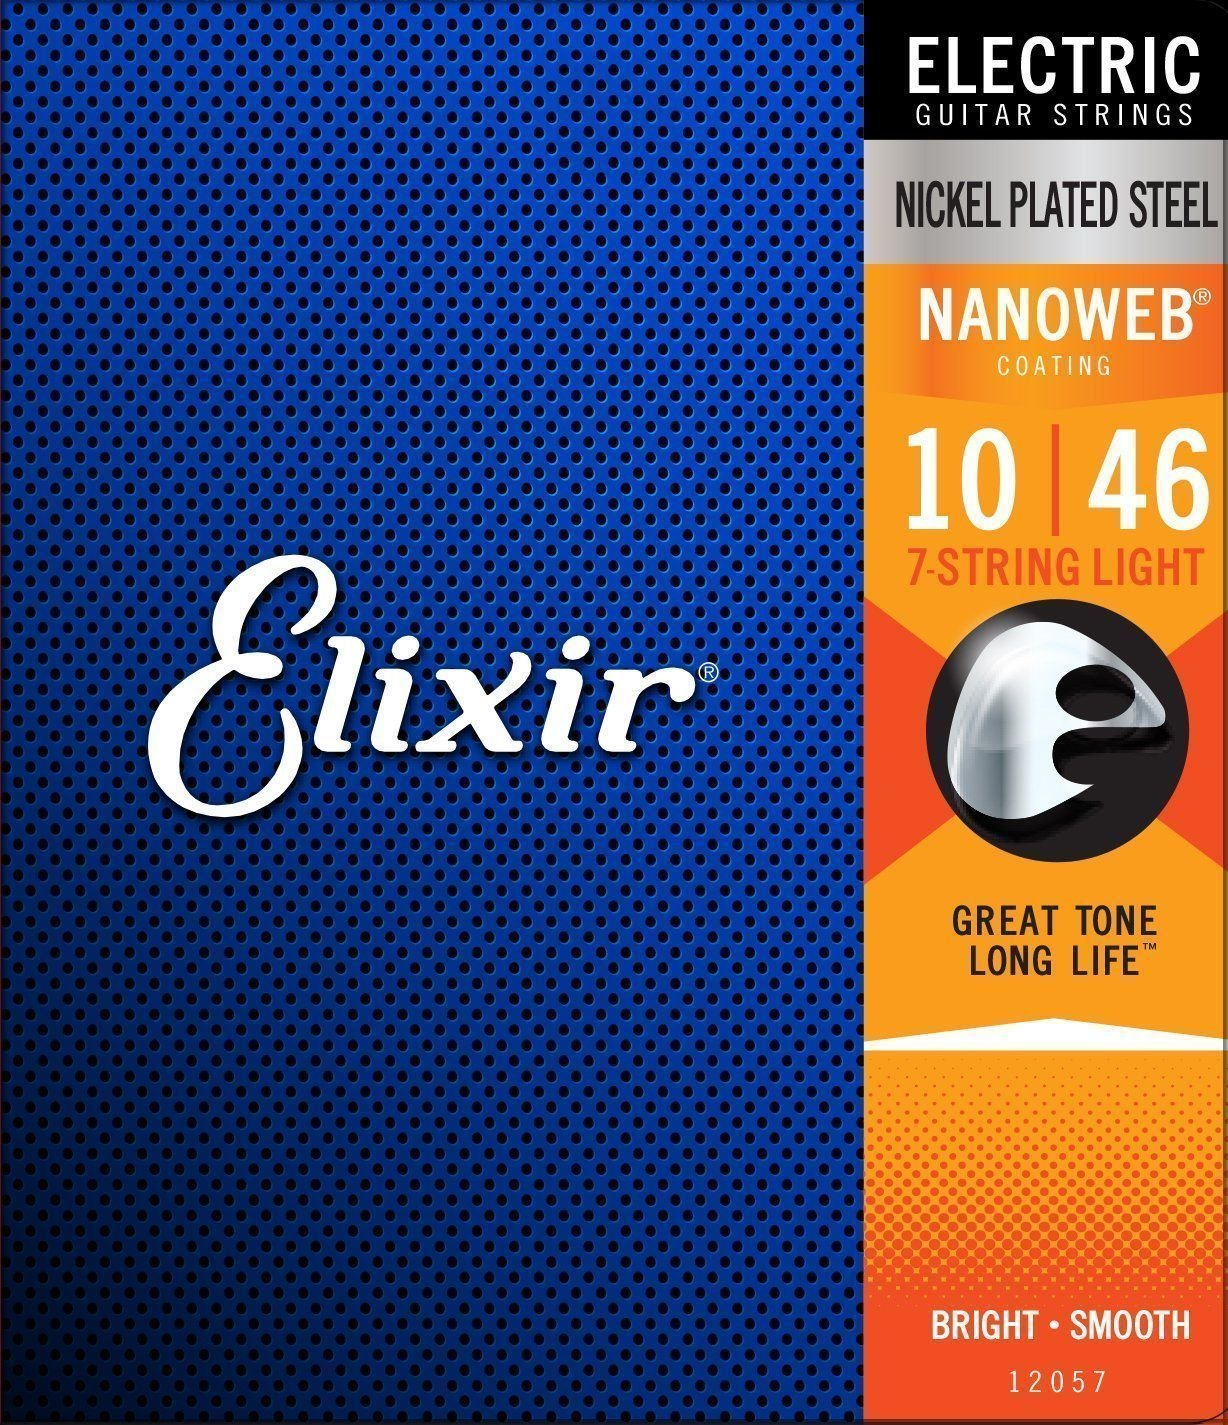 Elixir Nanoweb 7-string 10/56